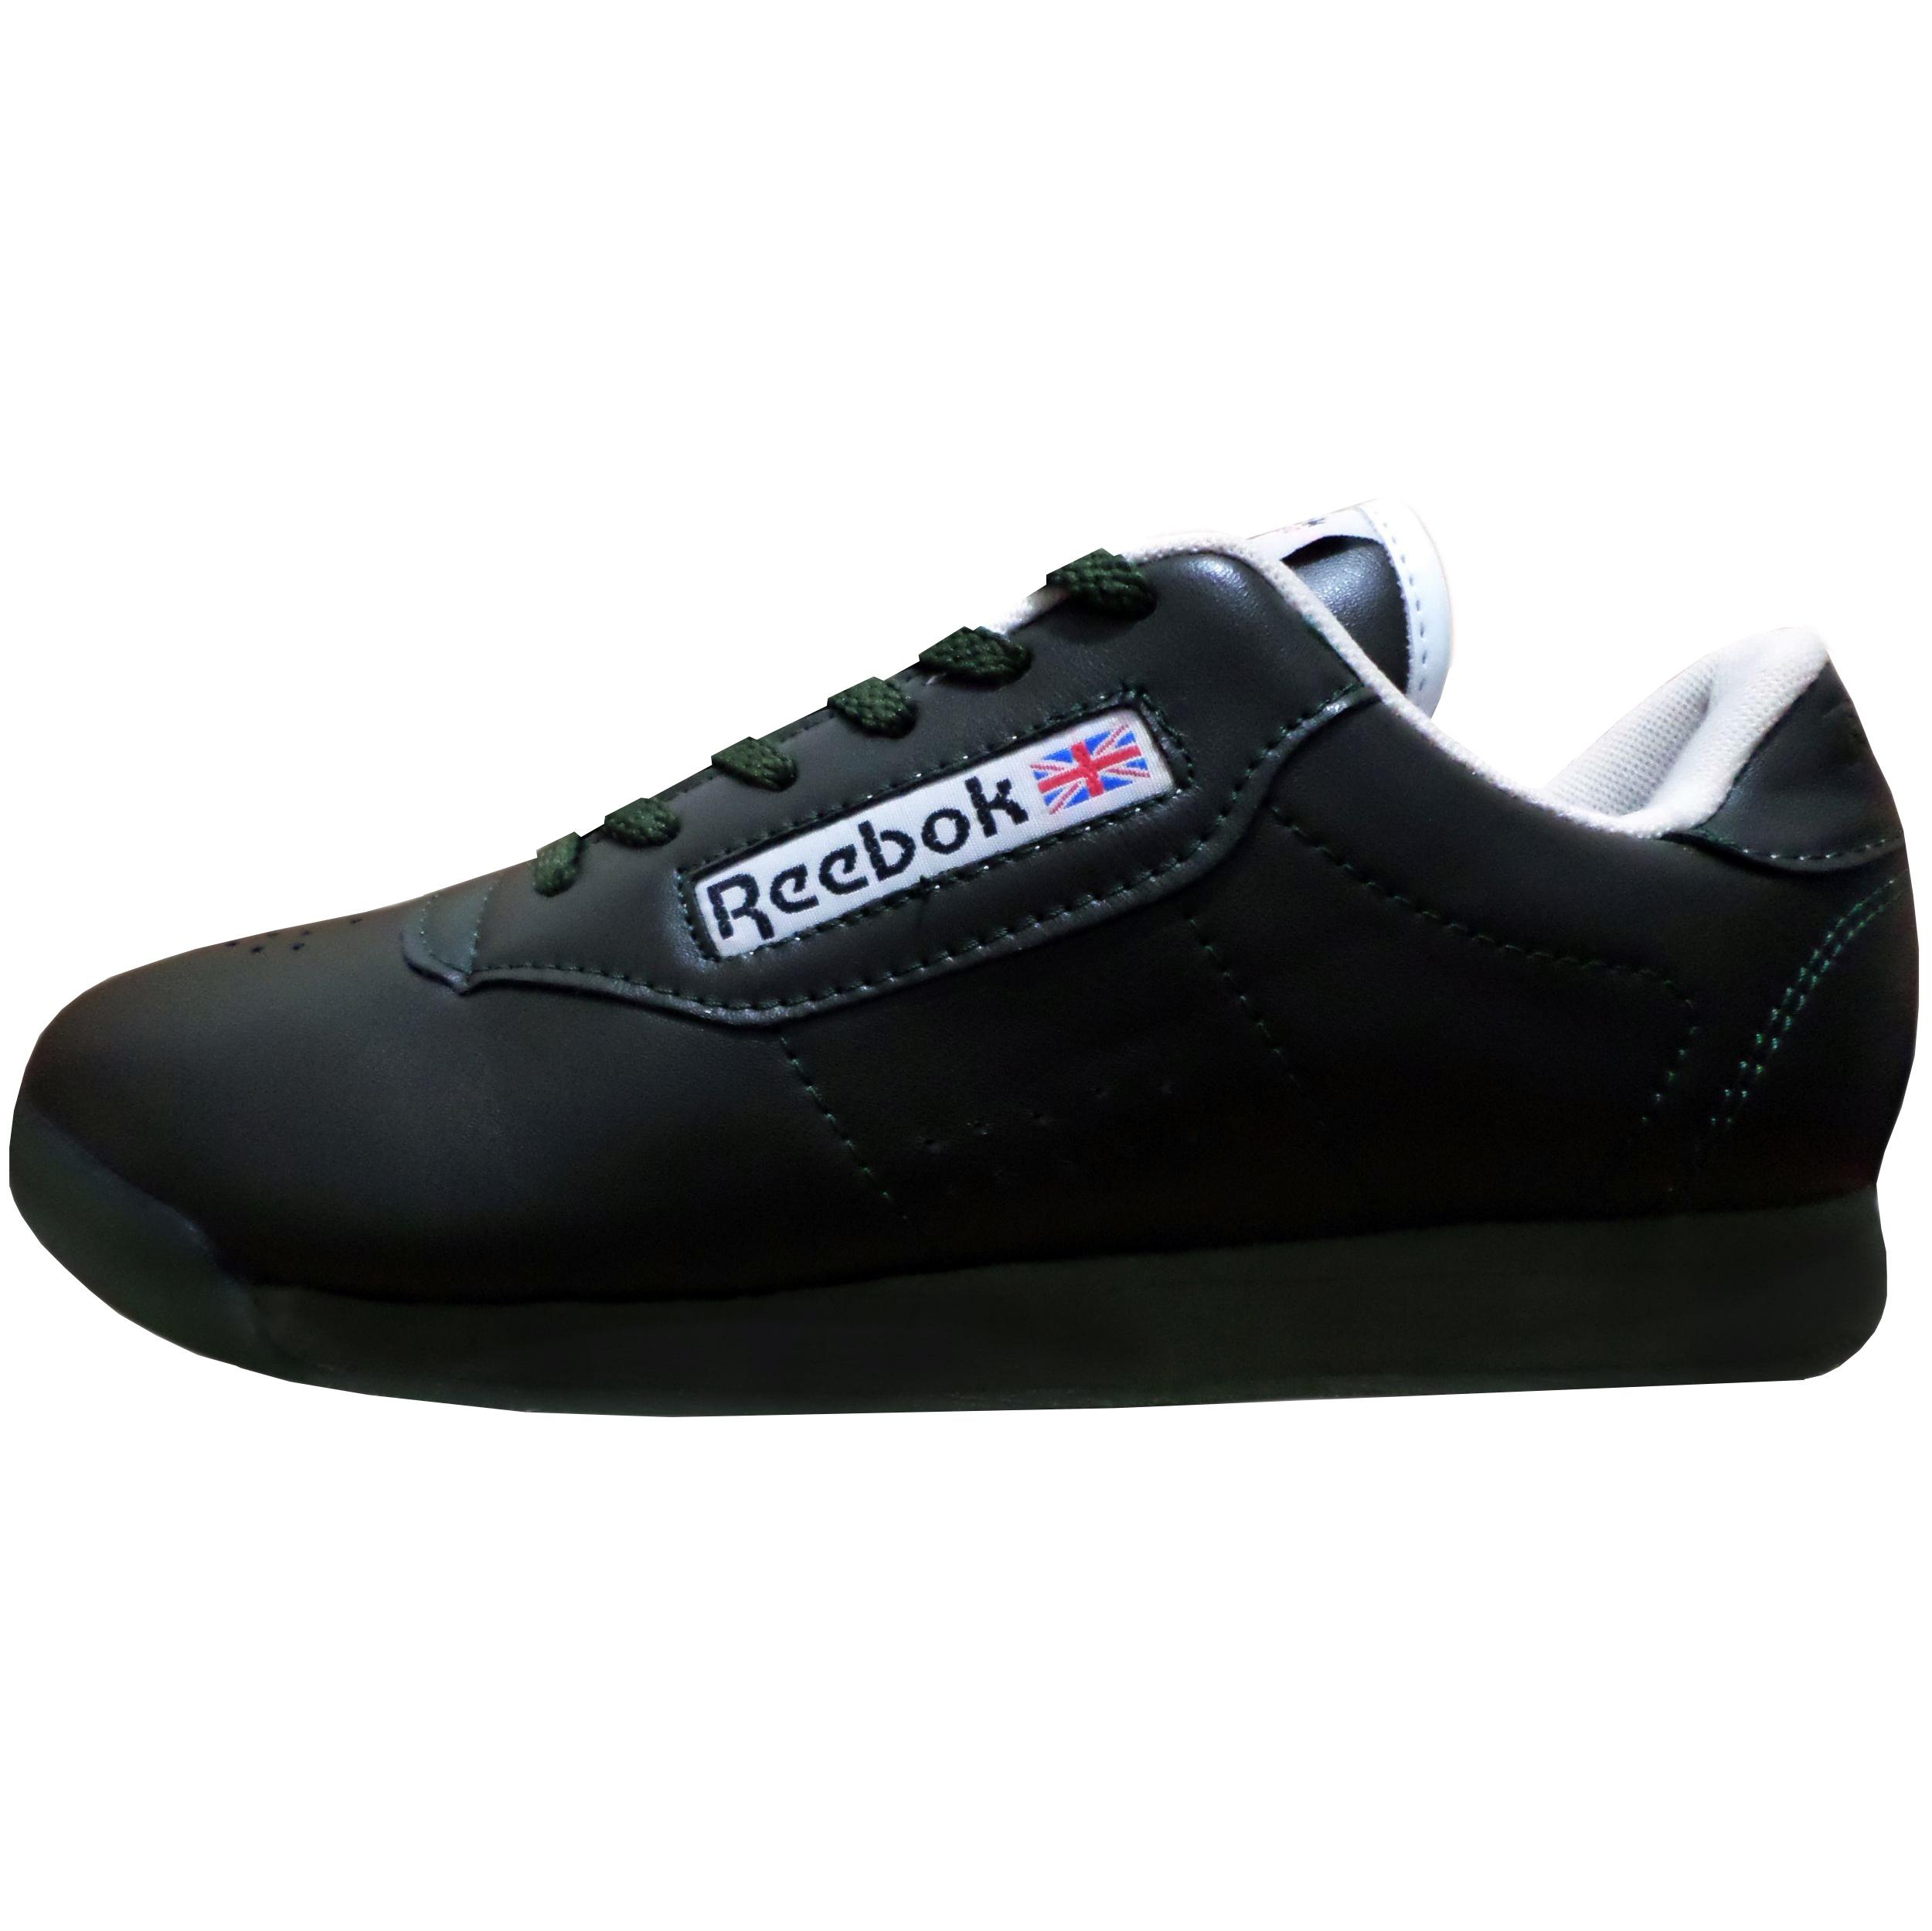 کفش راحتی زنانه ریباک کد 005